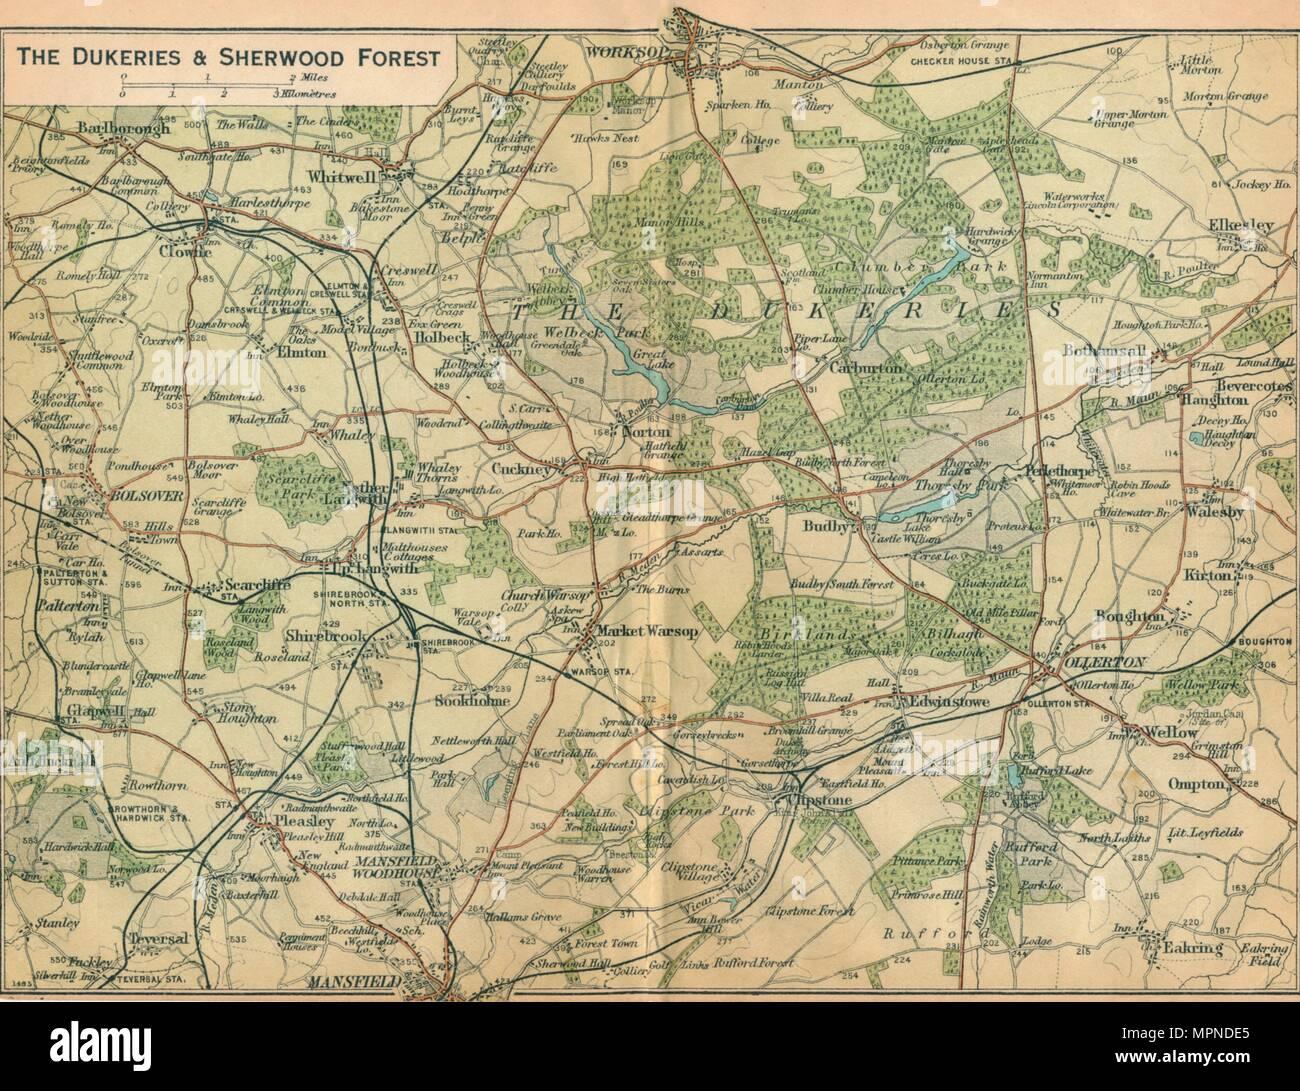 'The Dukeries & Sherwood Forest', c20th Century. Artist: John Bartholomew. - Stock Image